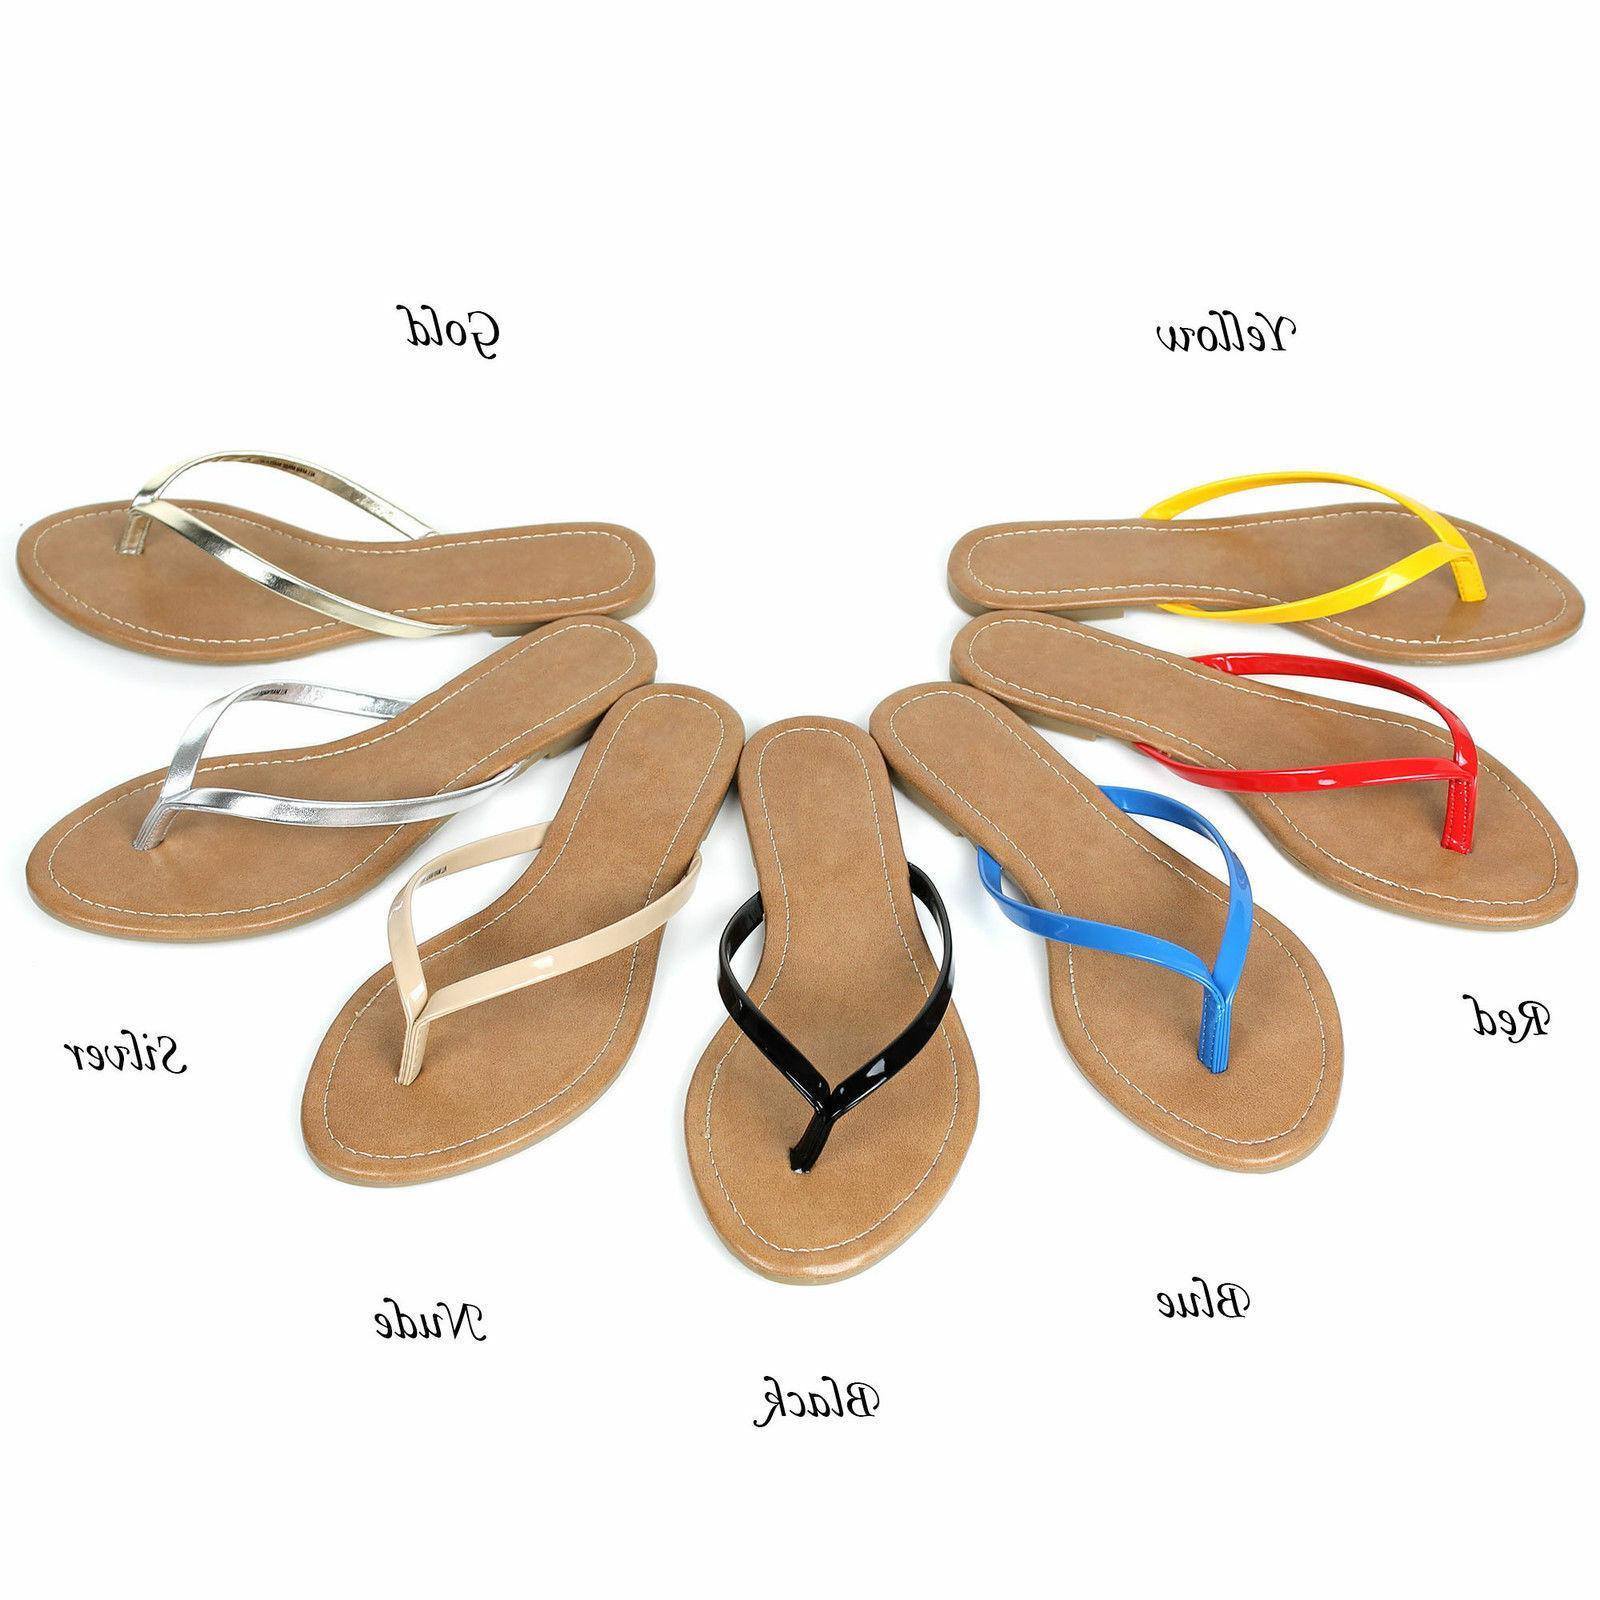 NEW Womens Comfort Casual Thong Flat Flip Flops Sandals